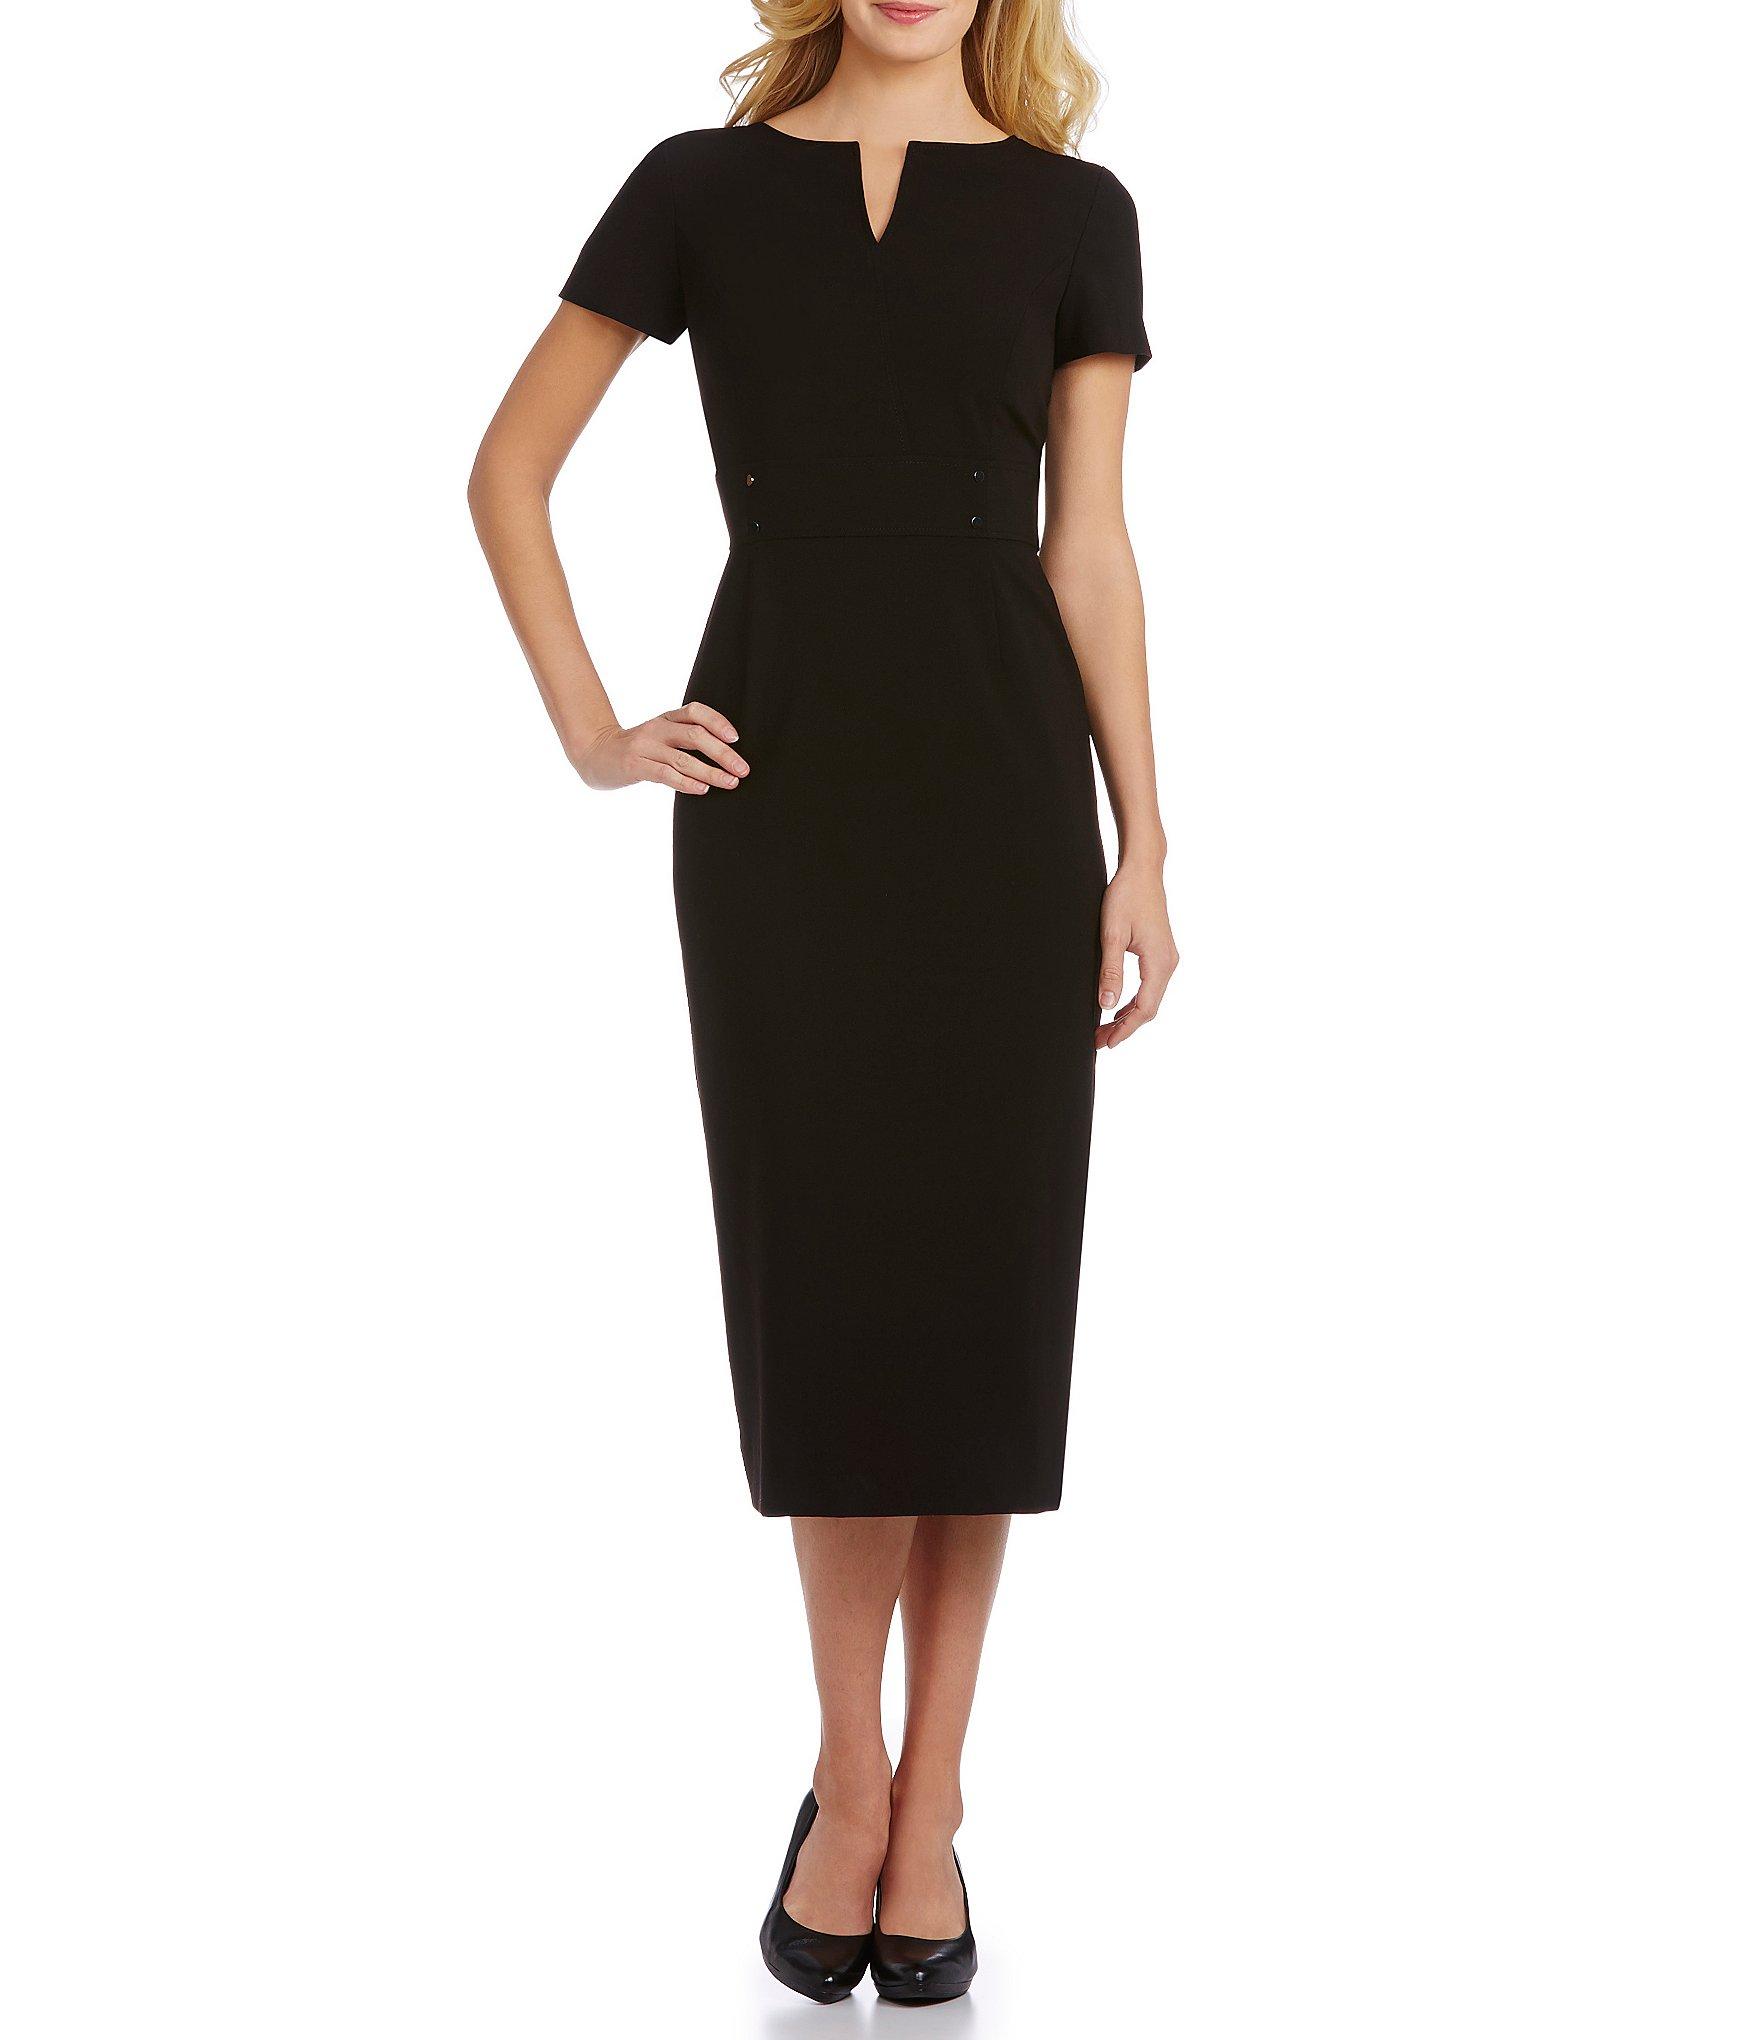 Black dress under knee - Black Dress Under Knee 34